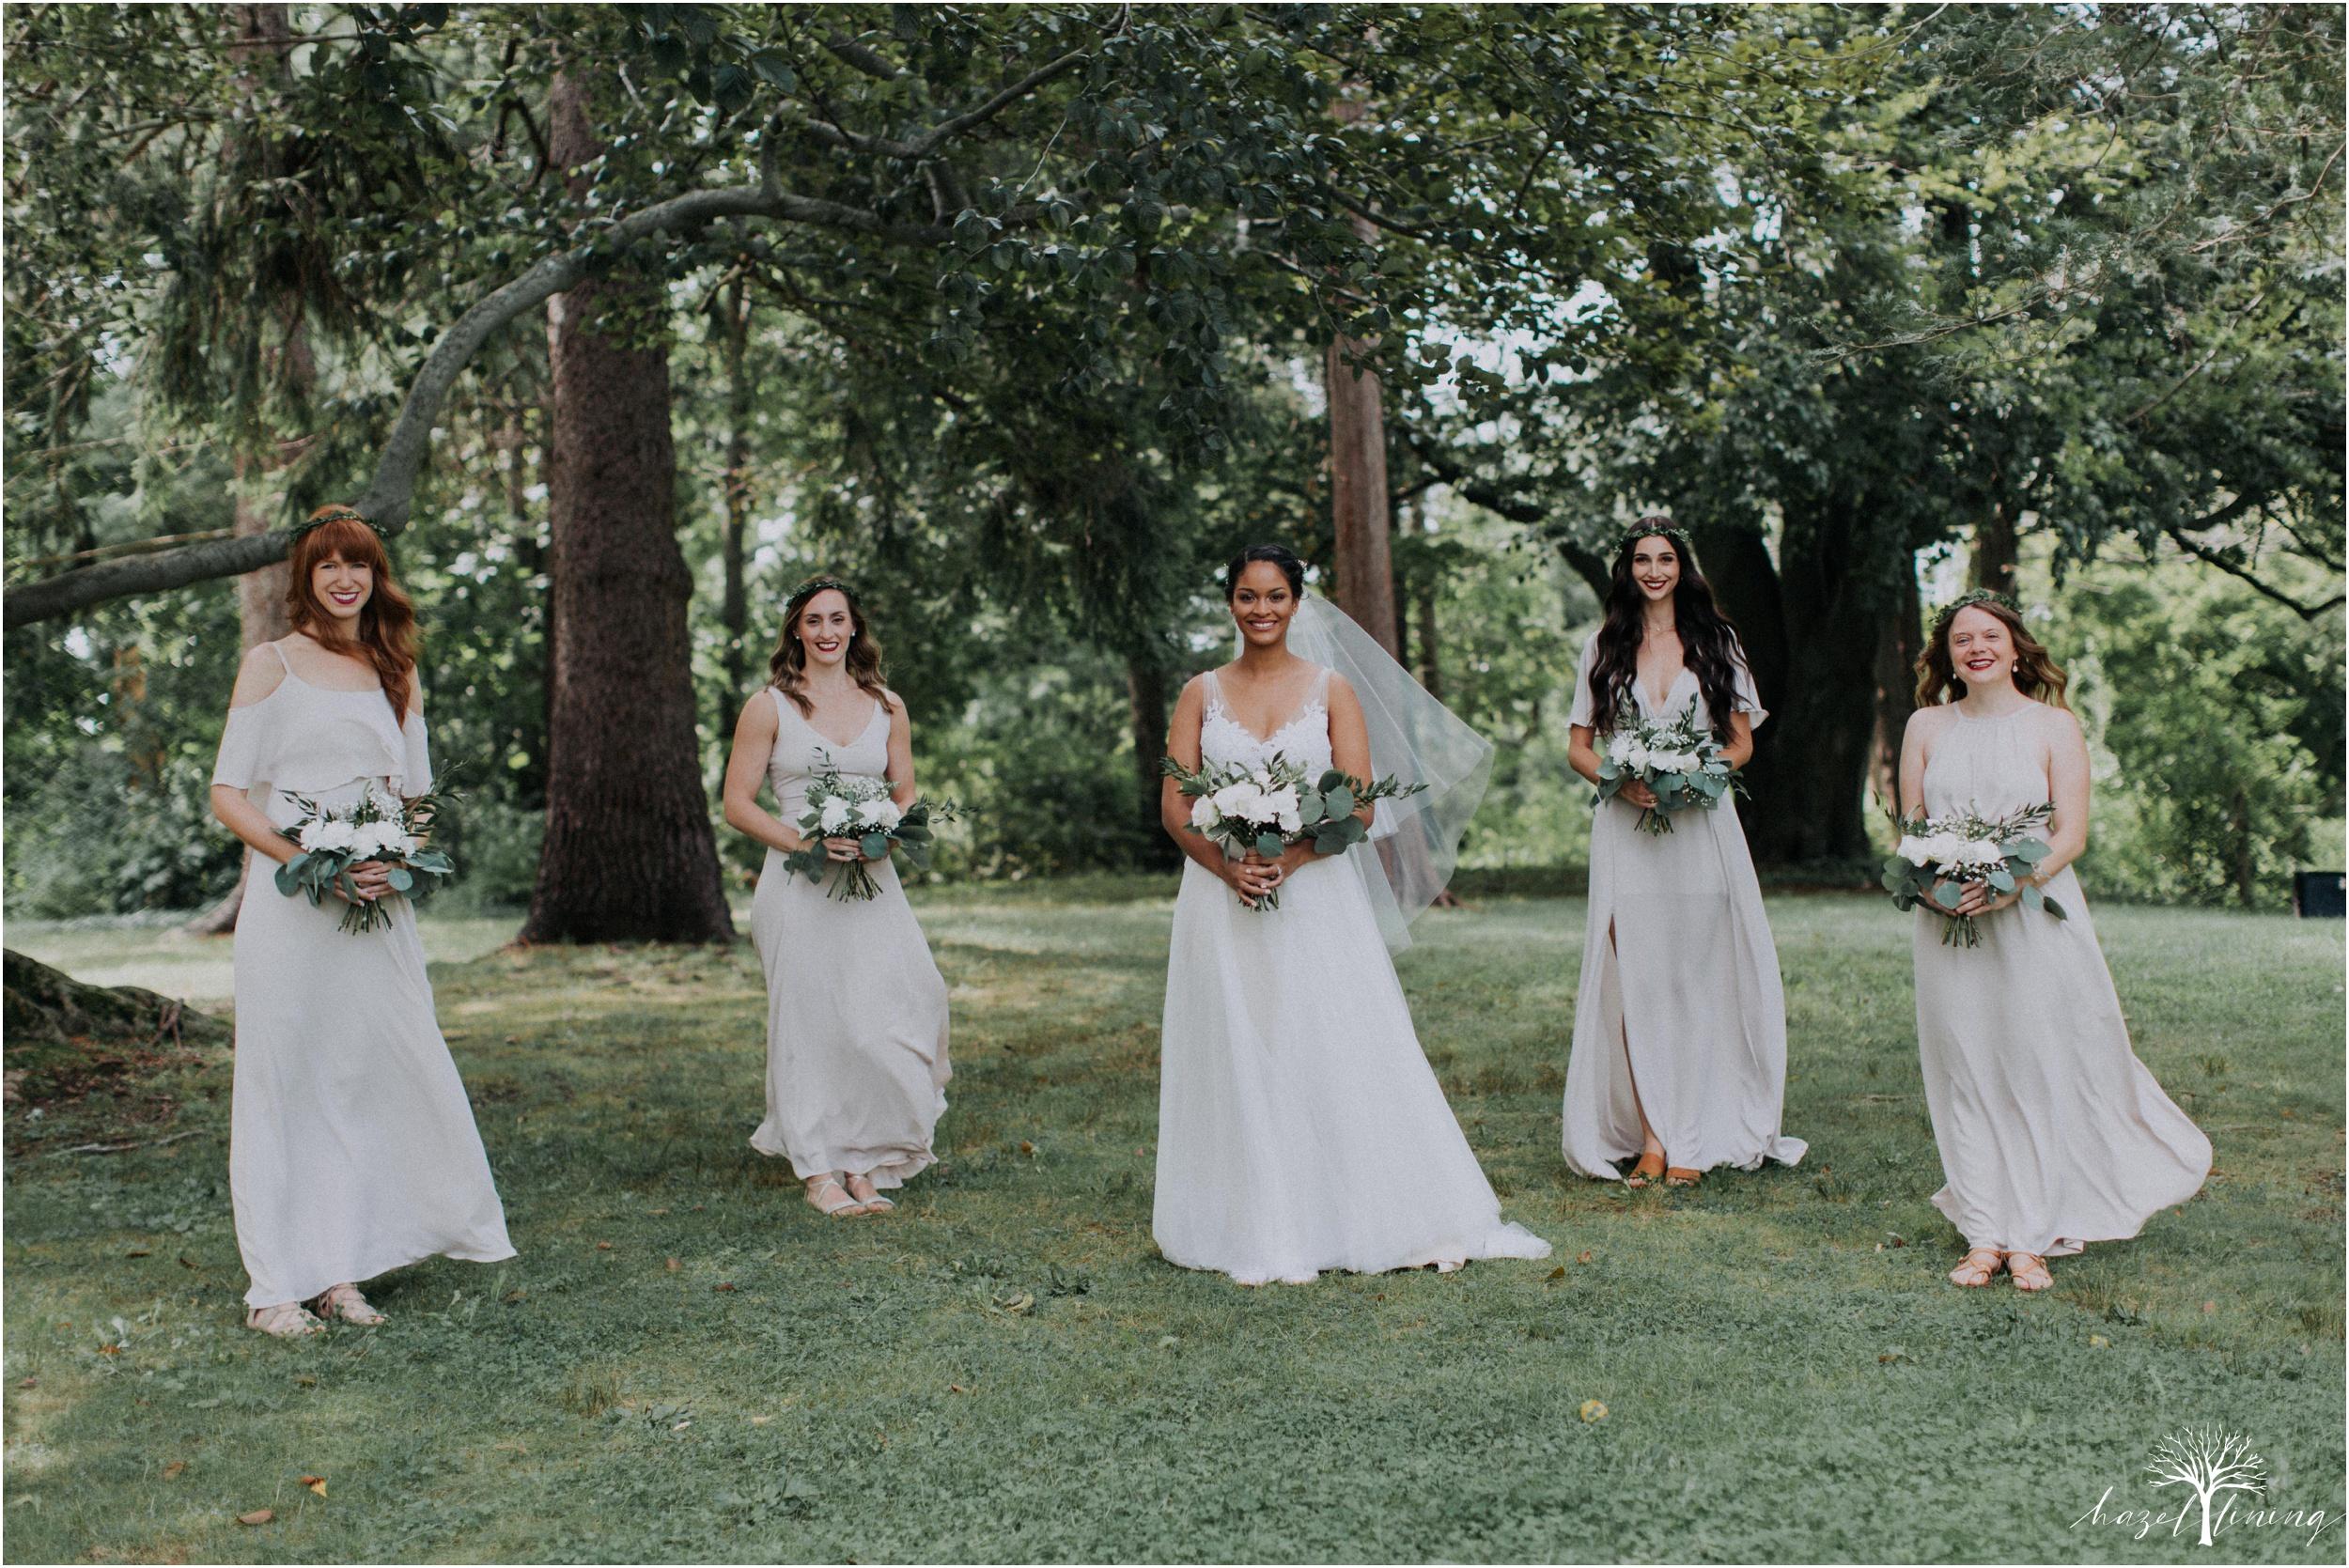 mariah-kreyling-samuel-sherratt-sherrattwiththeworld-peirce-farm-at-witch-hill-boston-massachusetts-wedding-photography-hazel-lining-travel-wedding-elopement-photography_0027.jpg